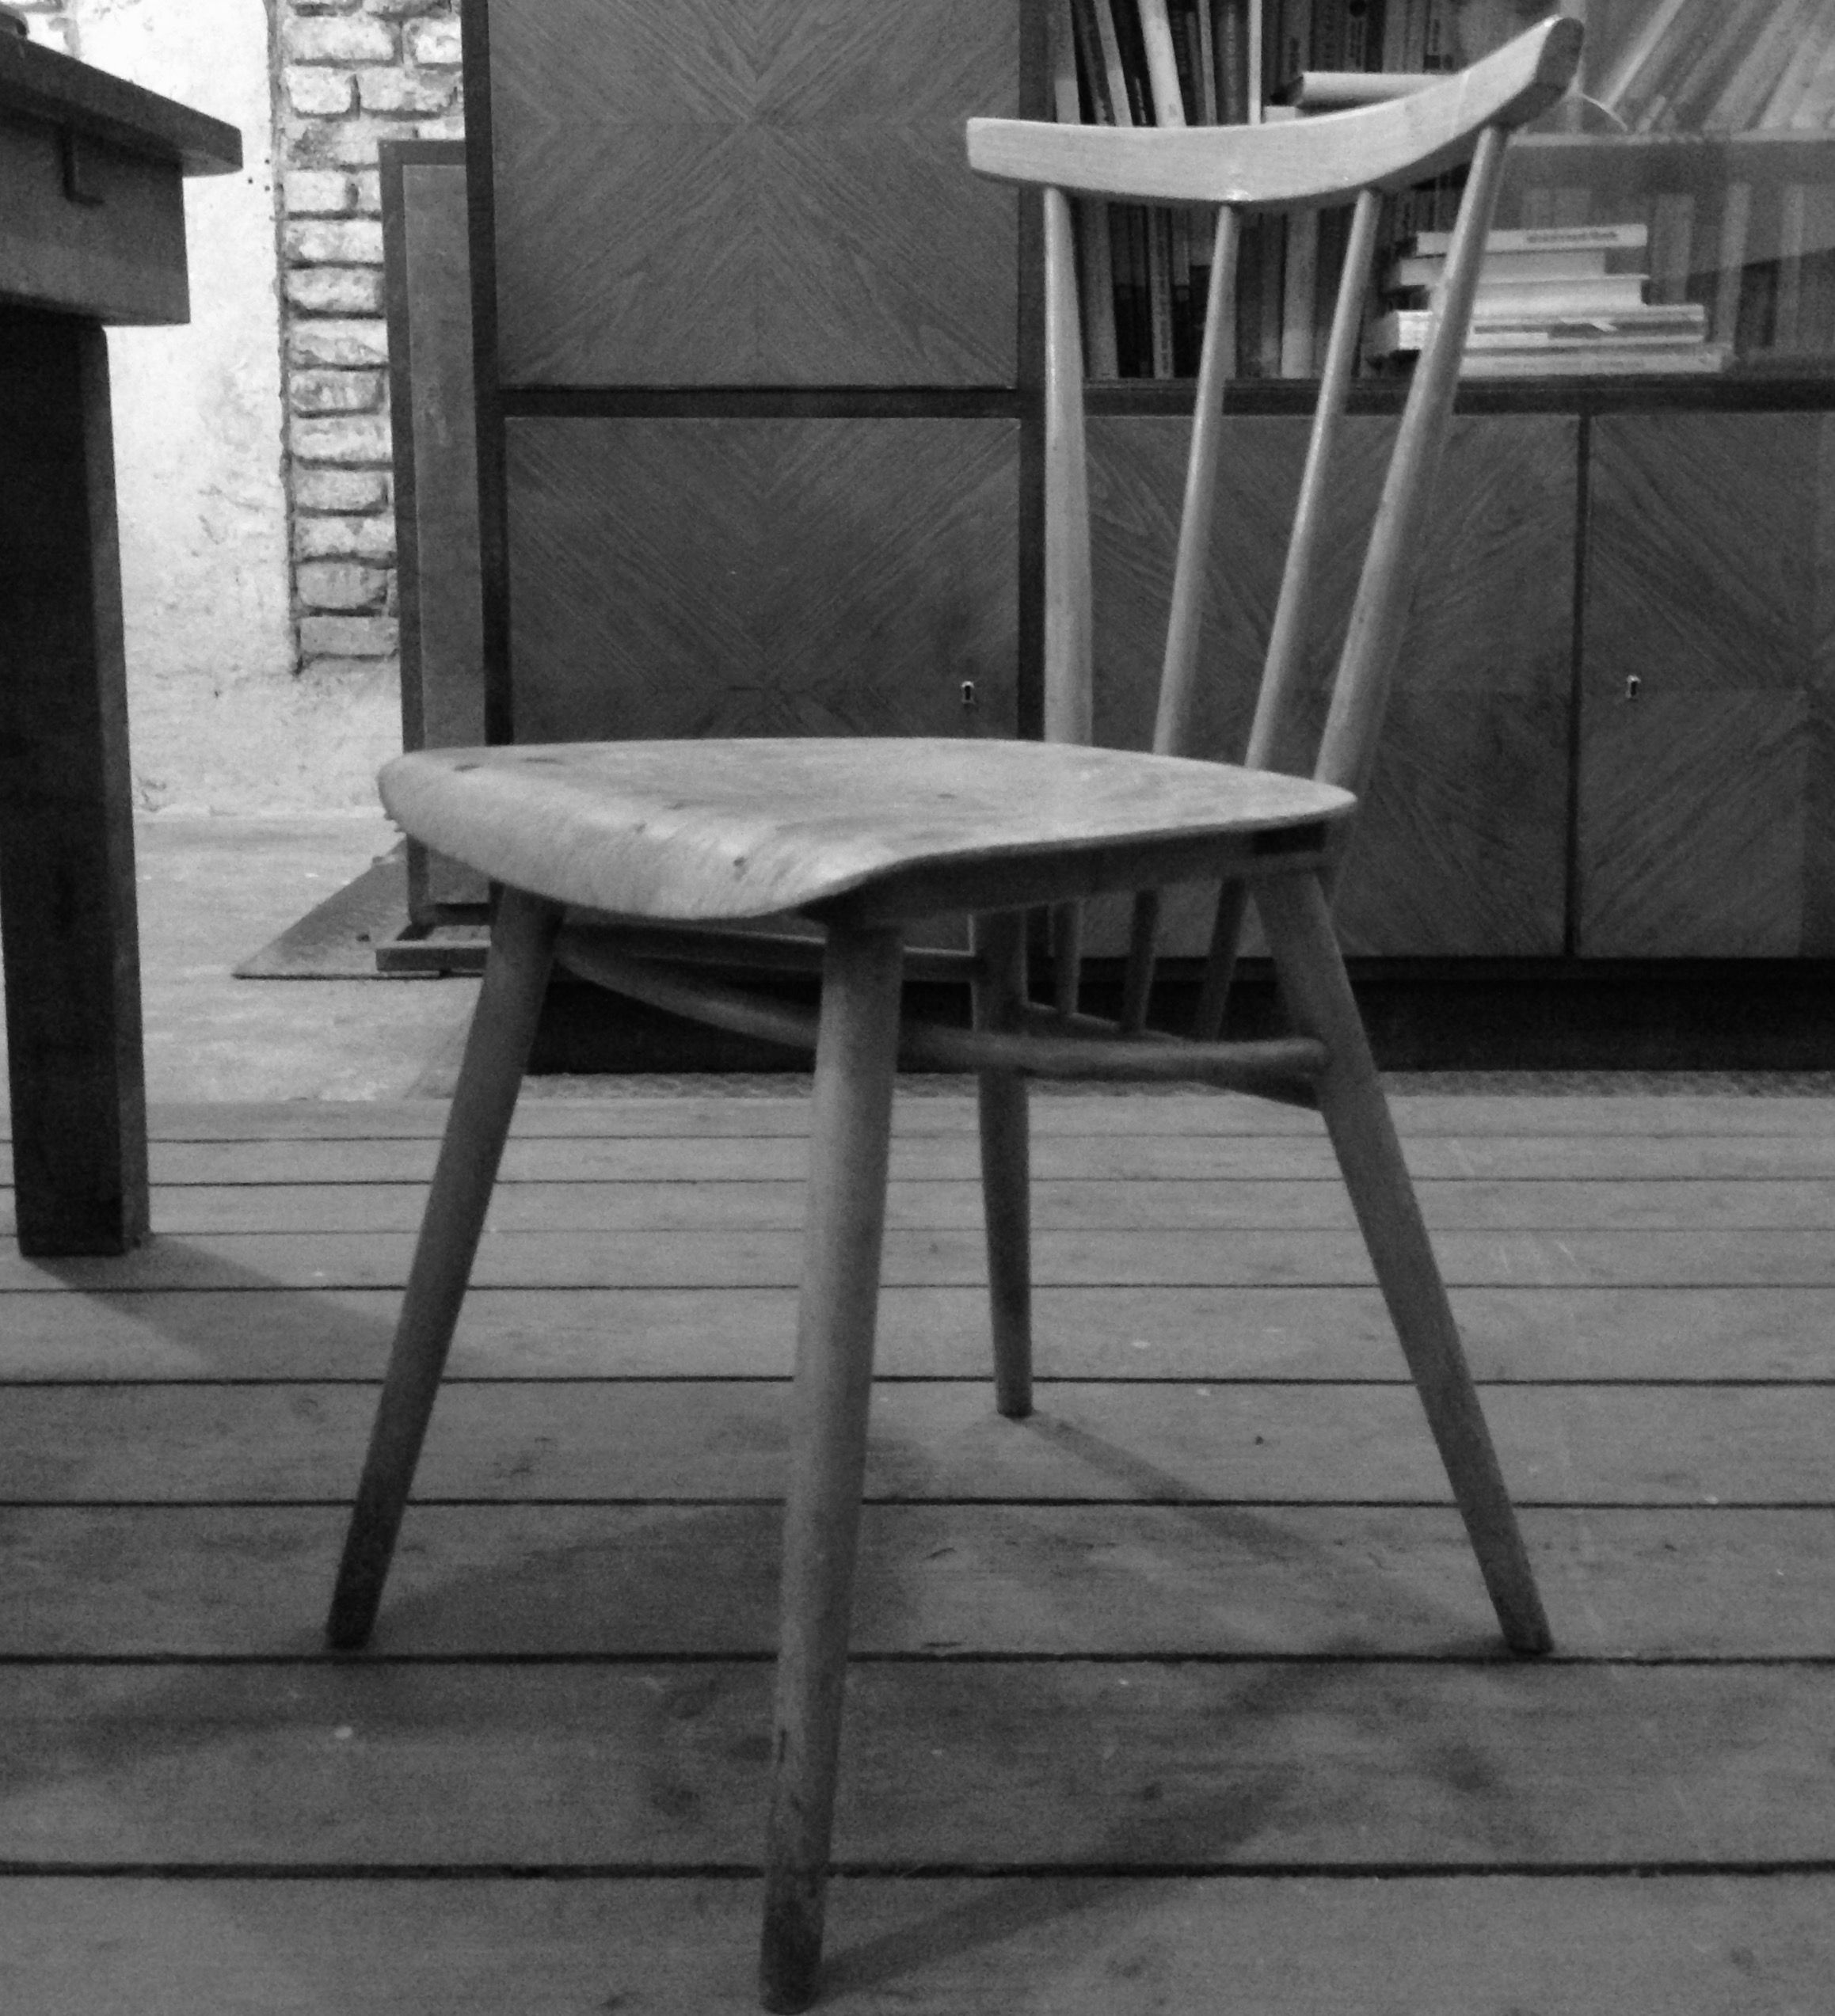 Tatra chair type from year 1966 TATRA chairs